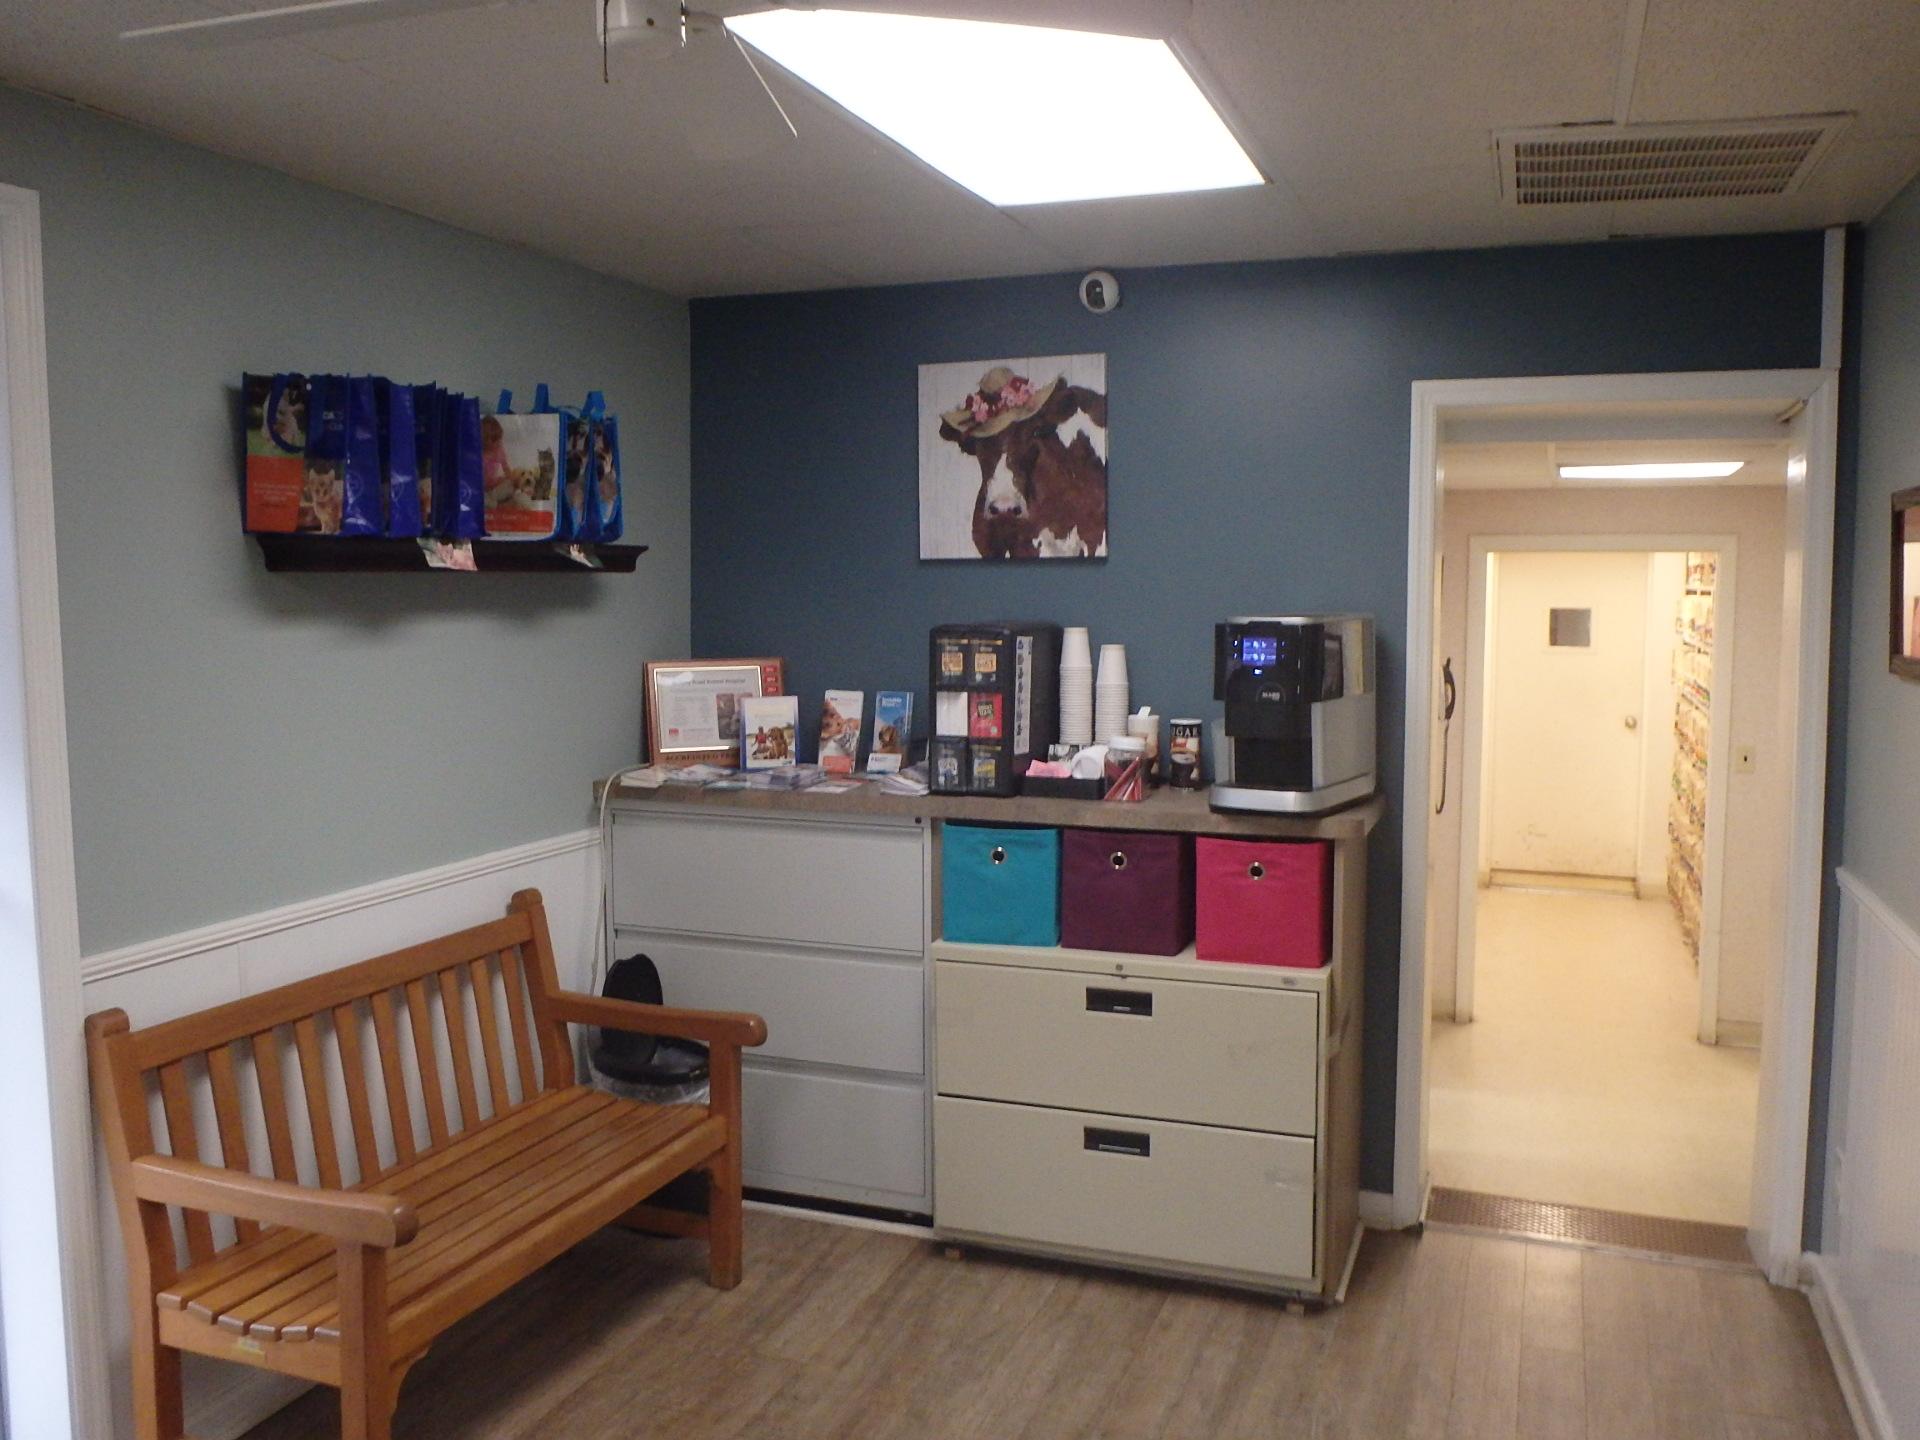 VCA Murphy Road Animal Hospital image 4